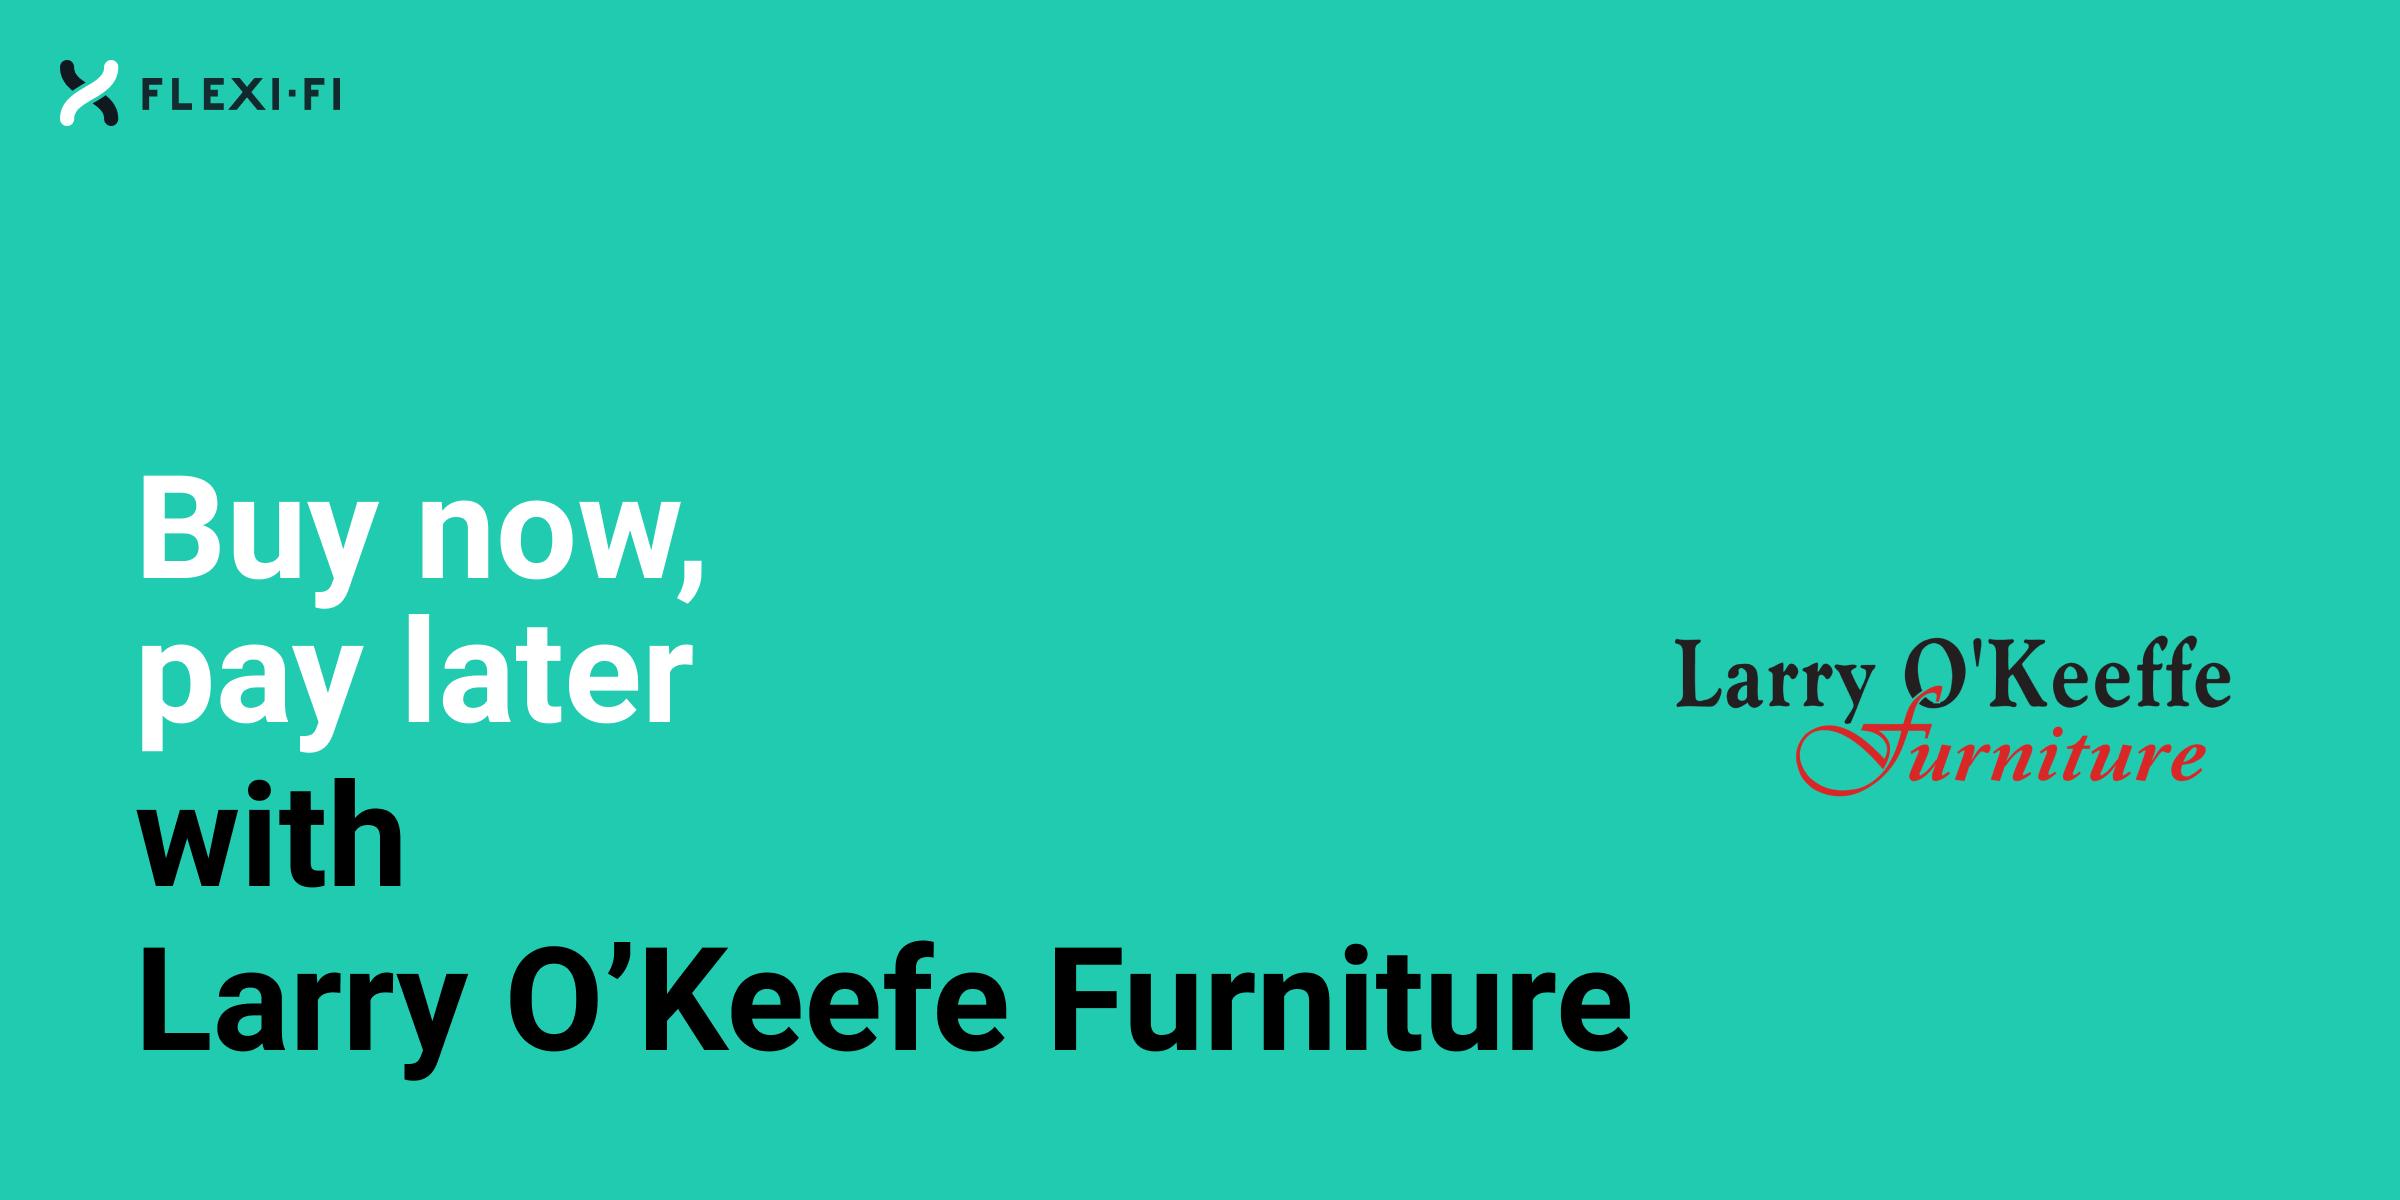 Retailer Larry O Keefe 1